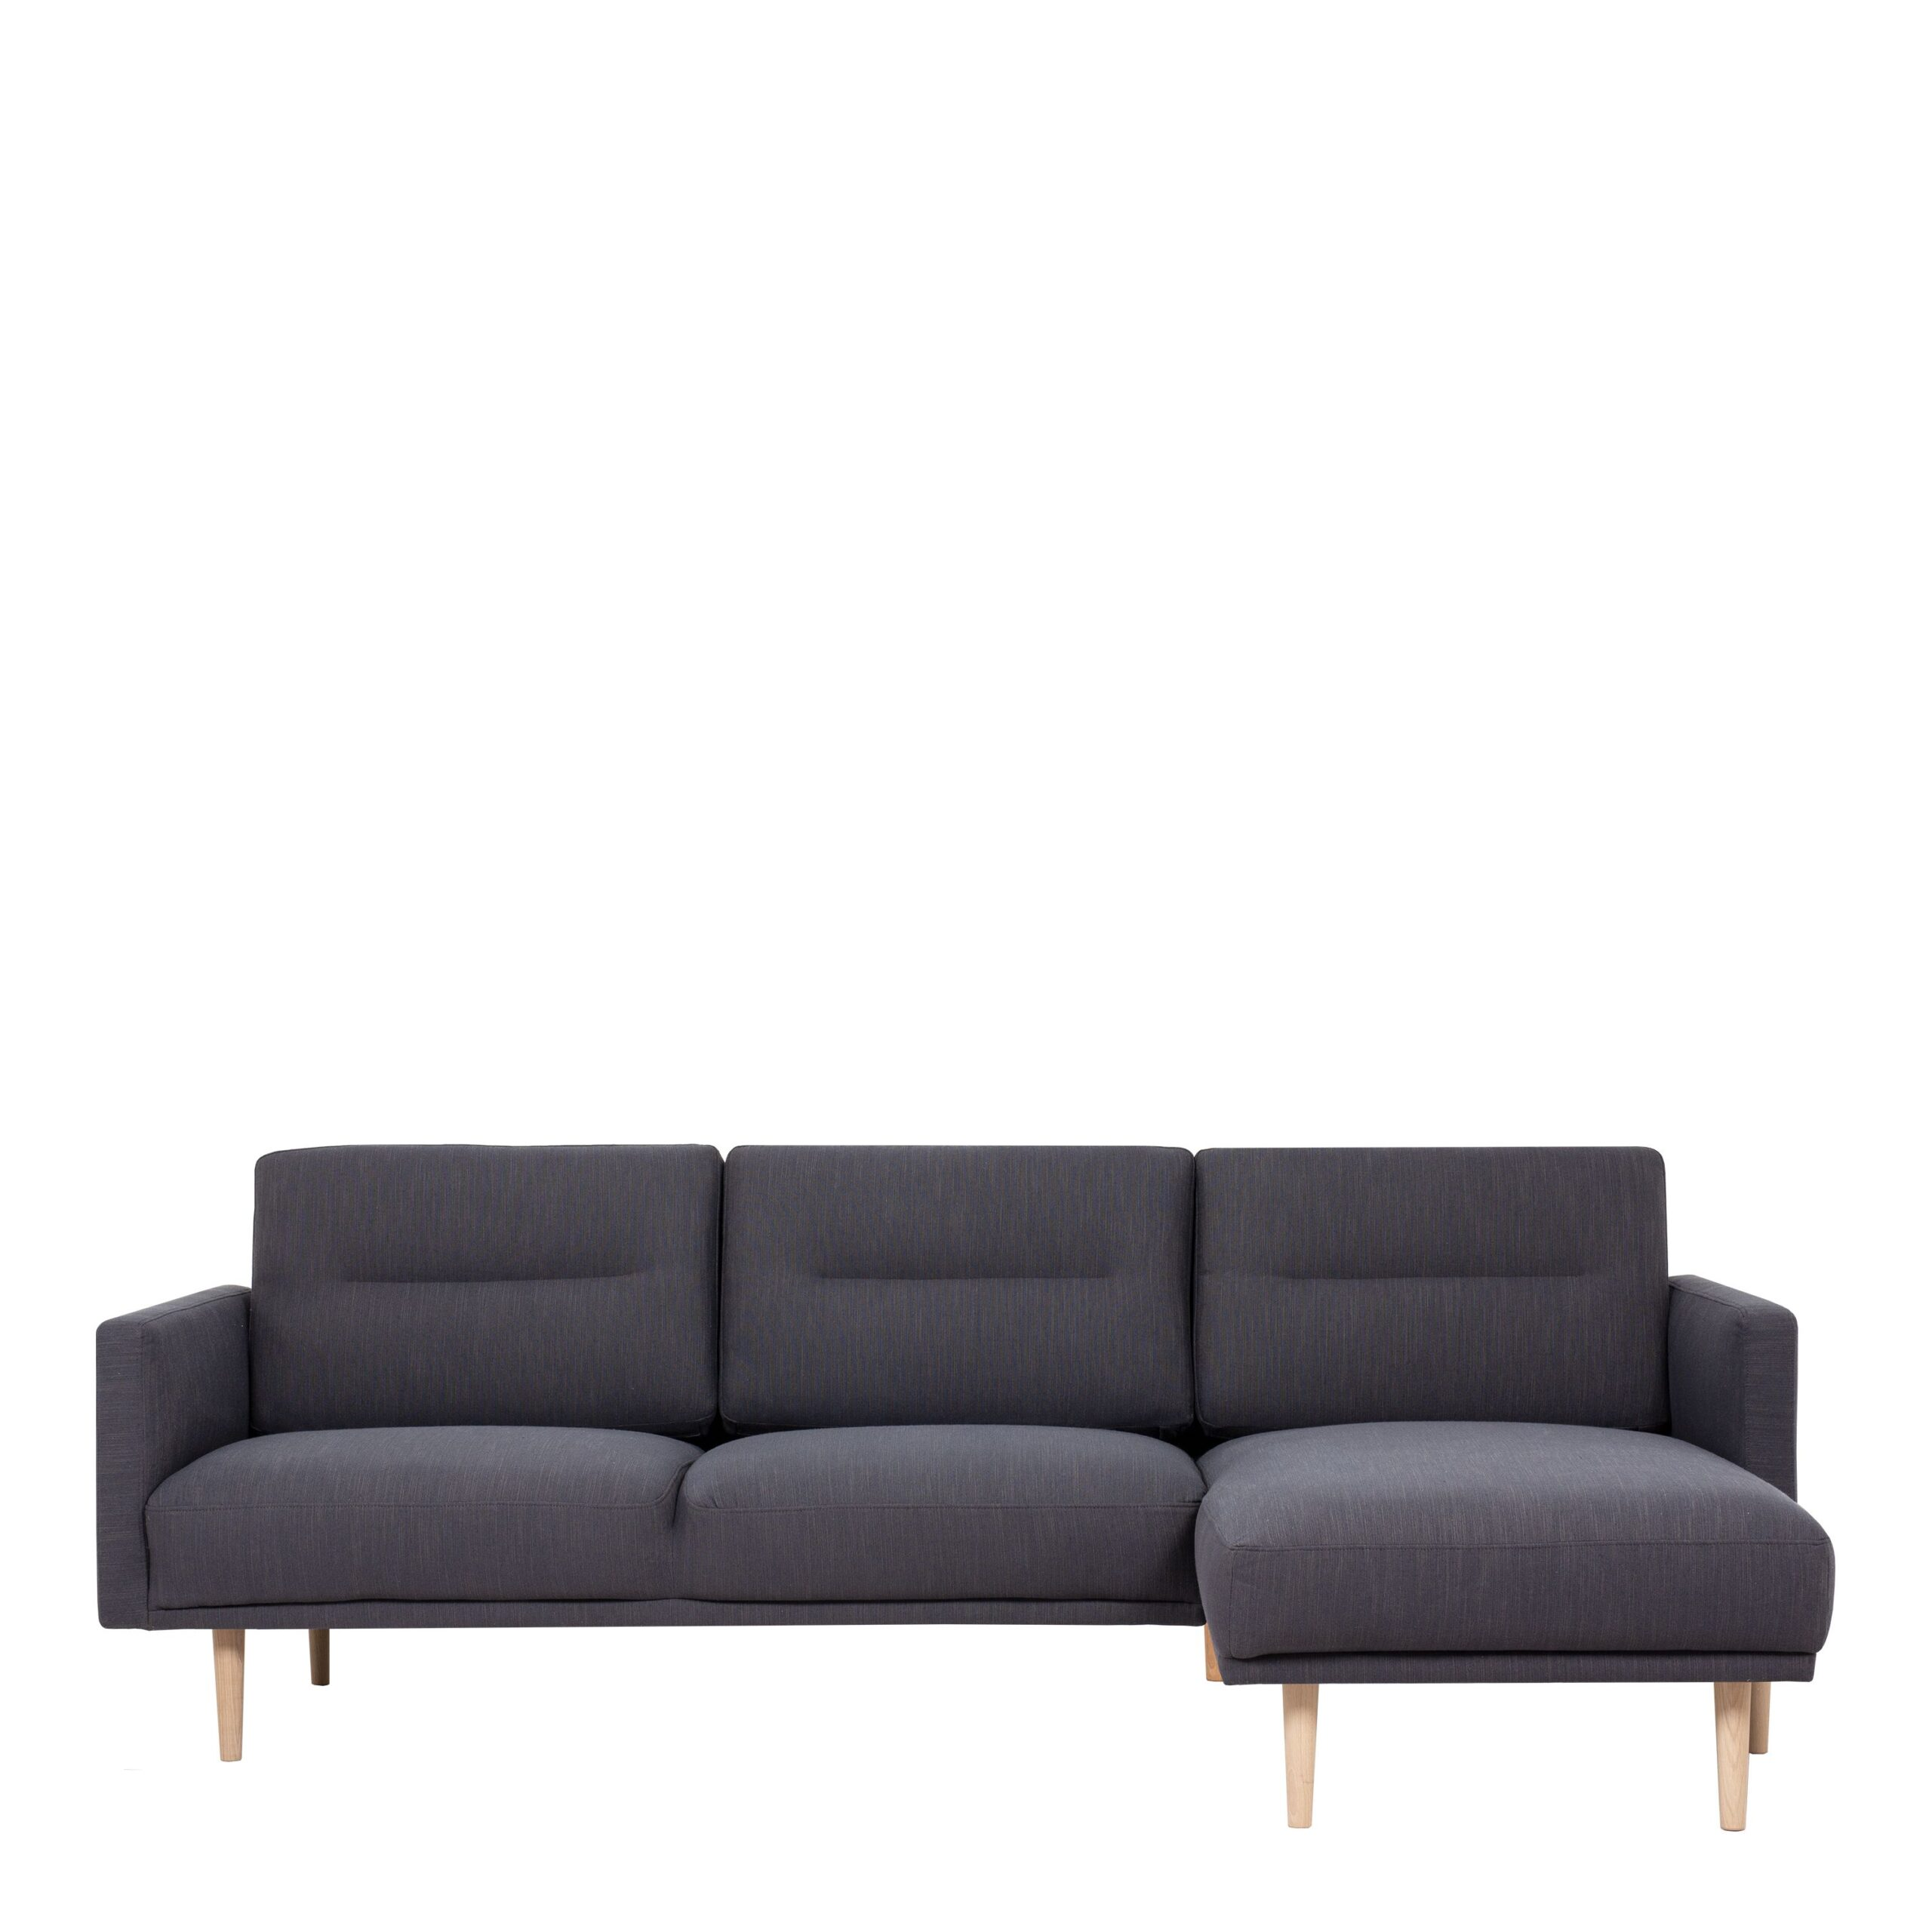 Vickie Chaiselongue Sofa (RH) - Antracit